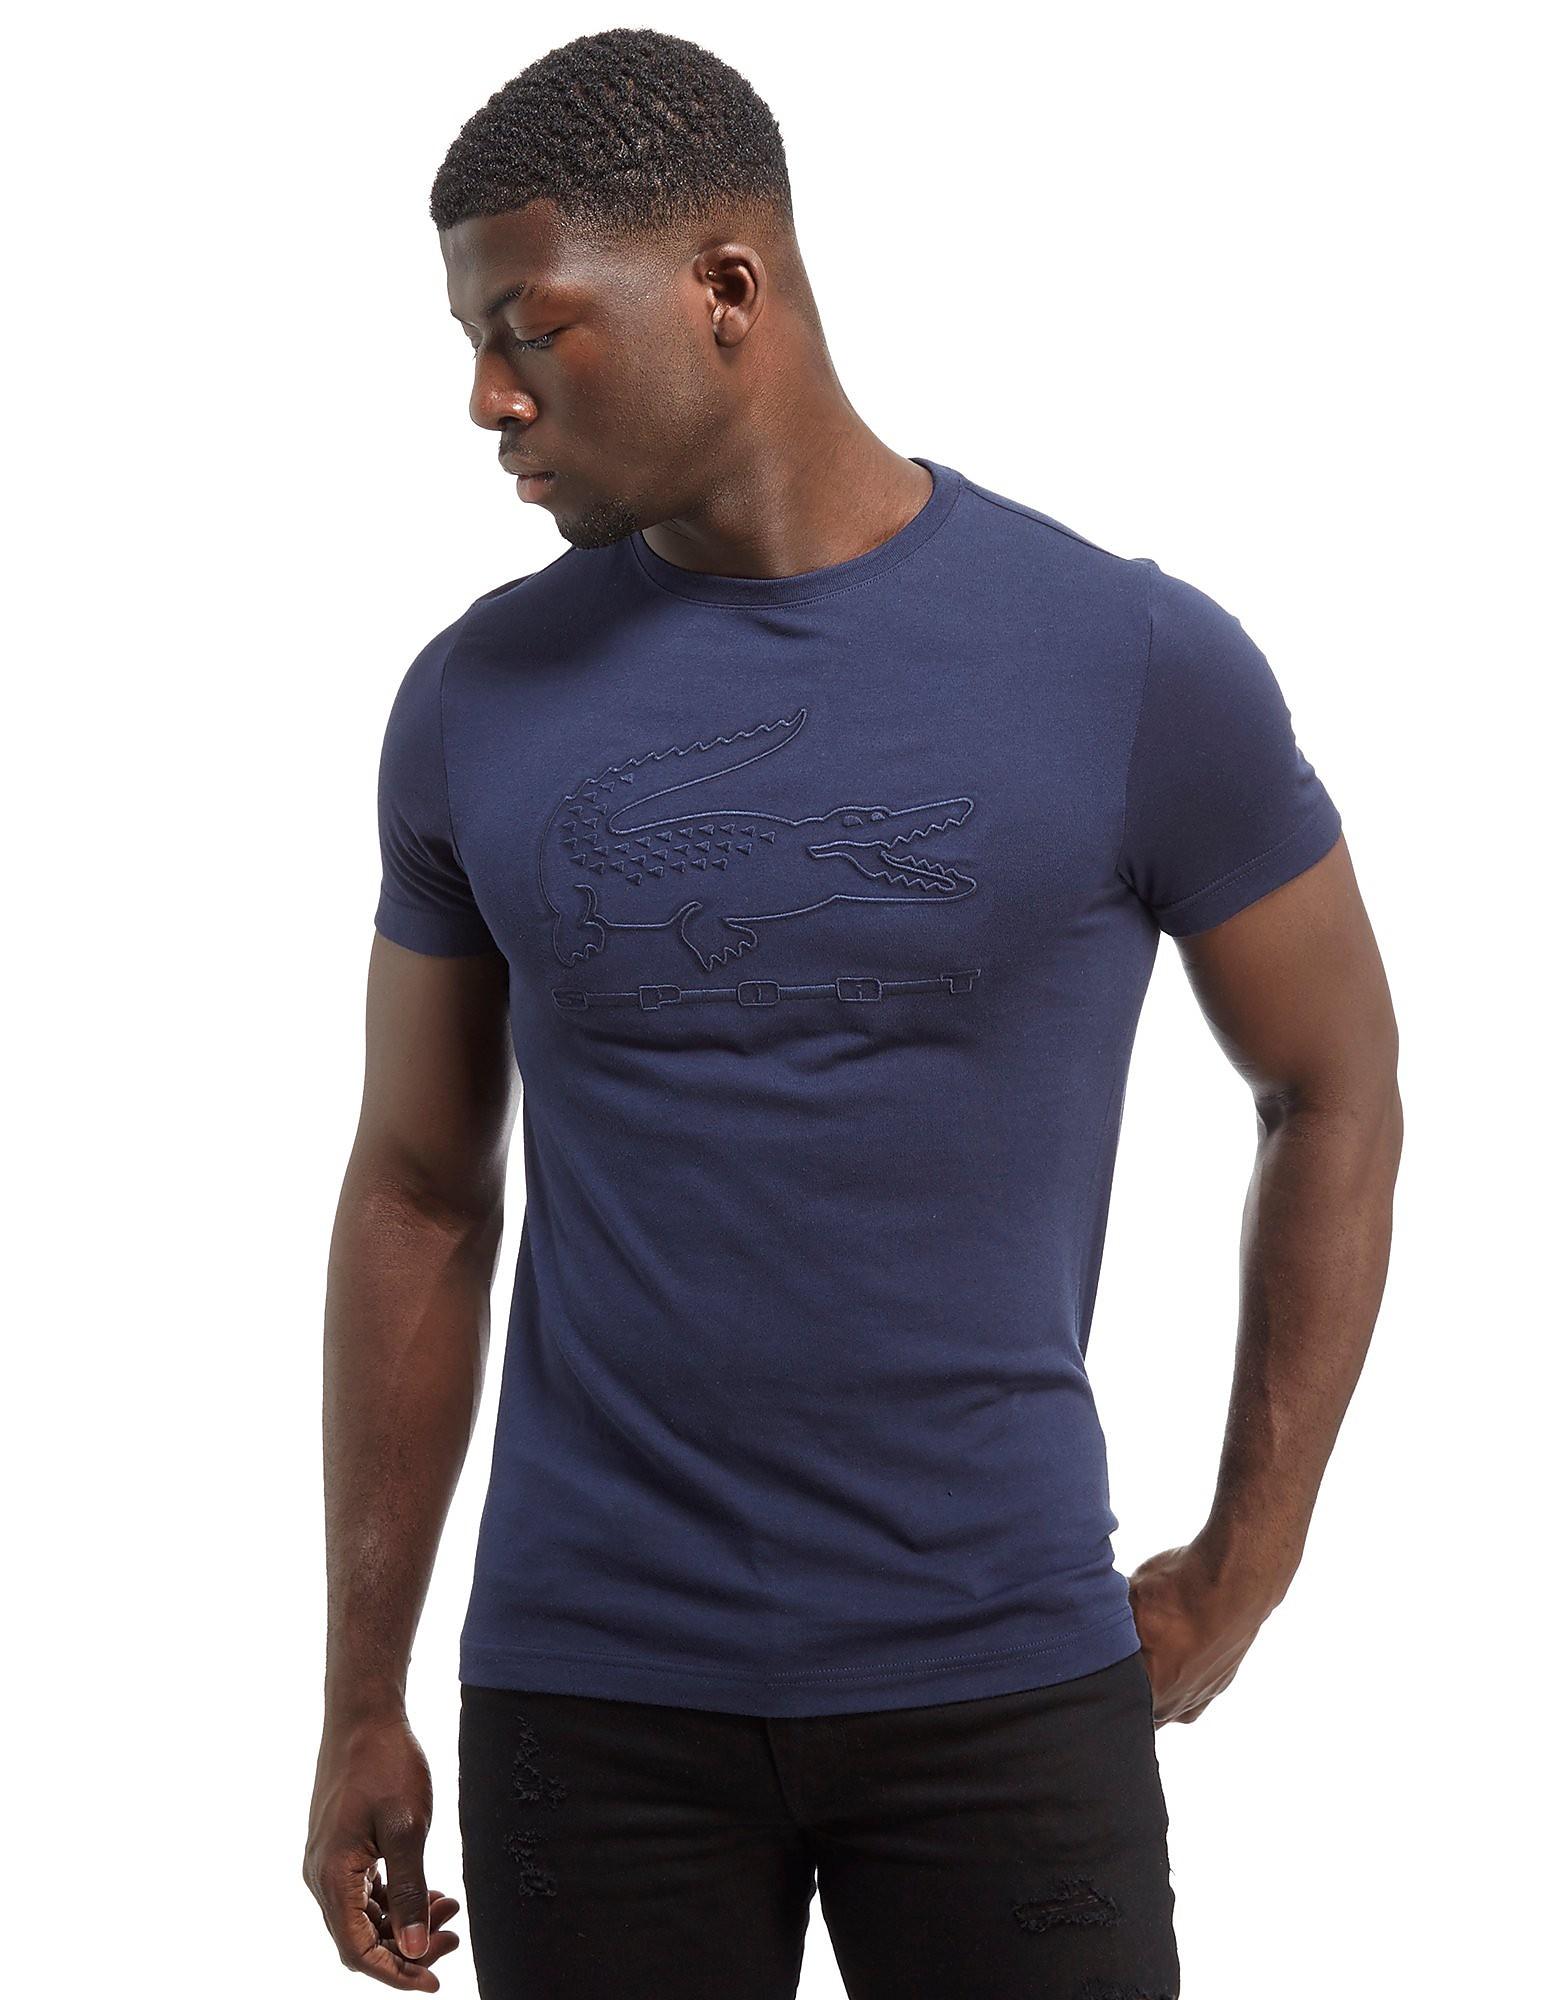 Lacoste Sport Tennis Embroidery Tech T-Shirt